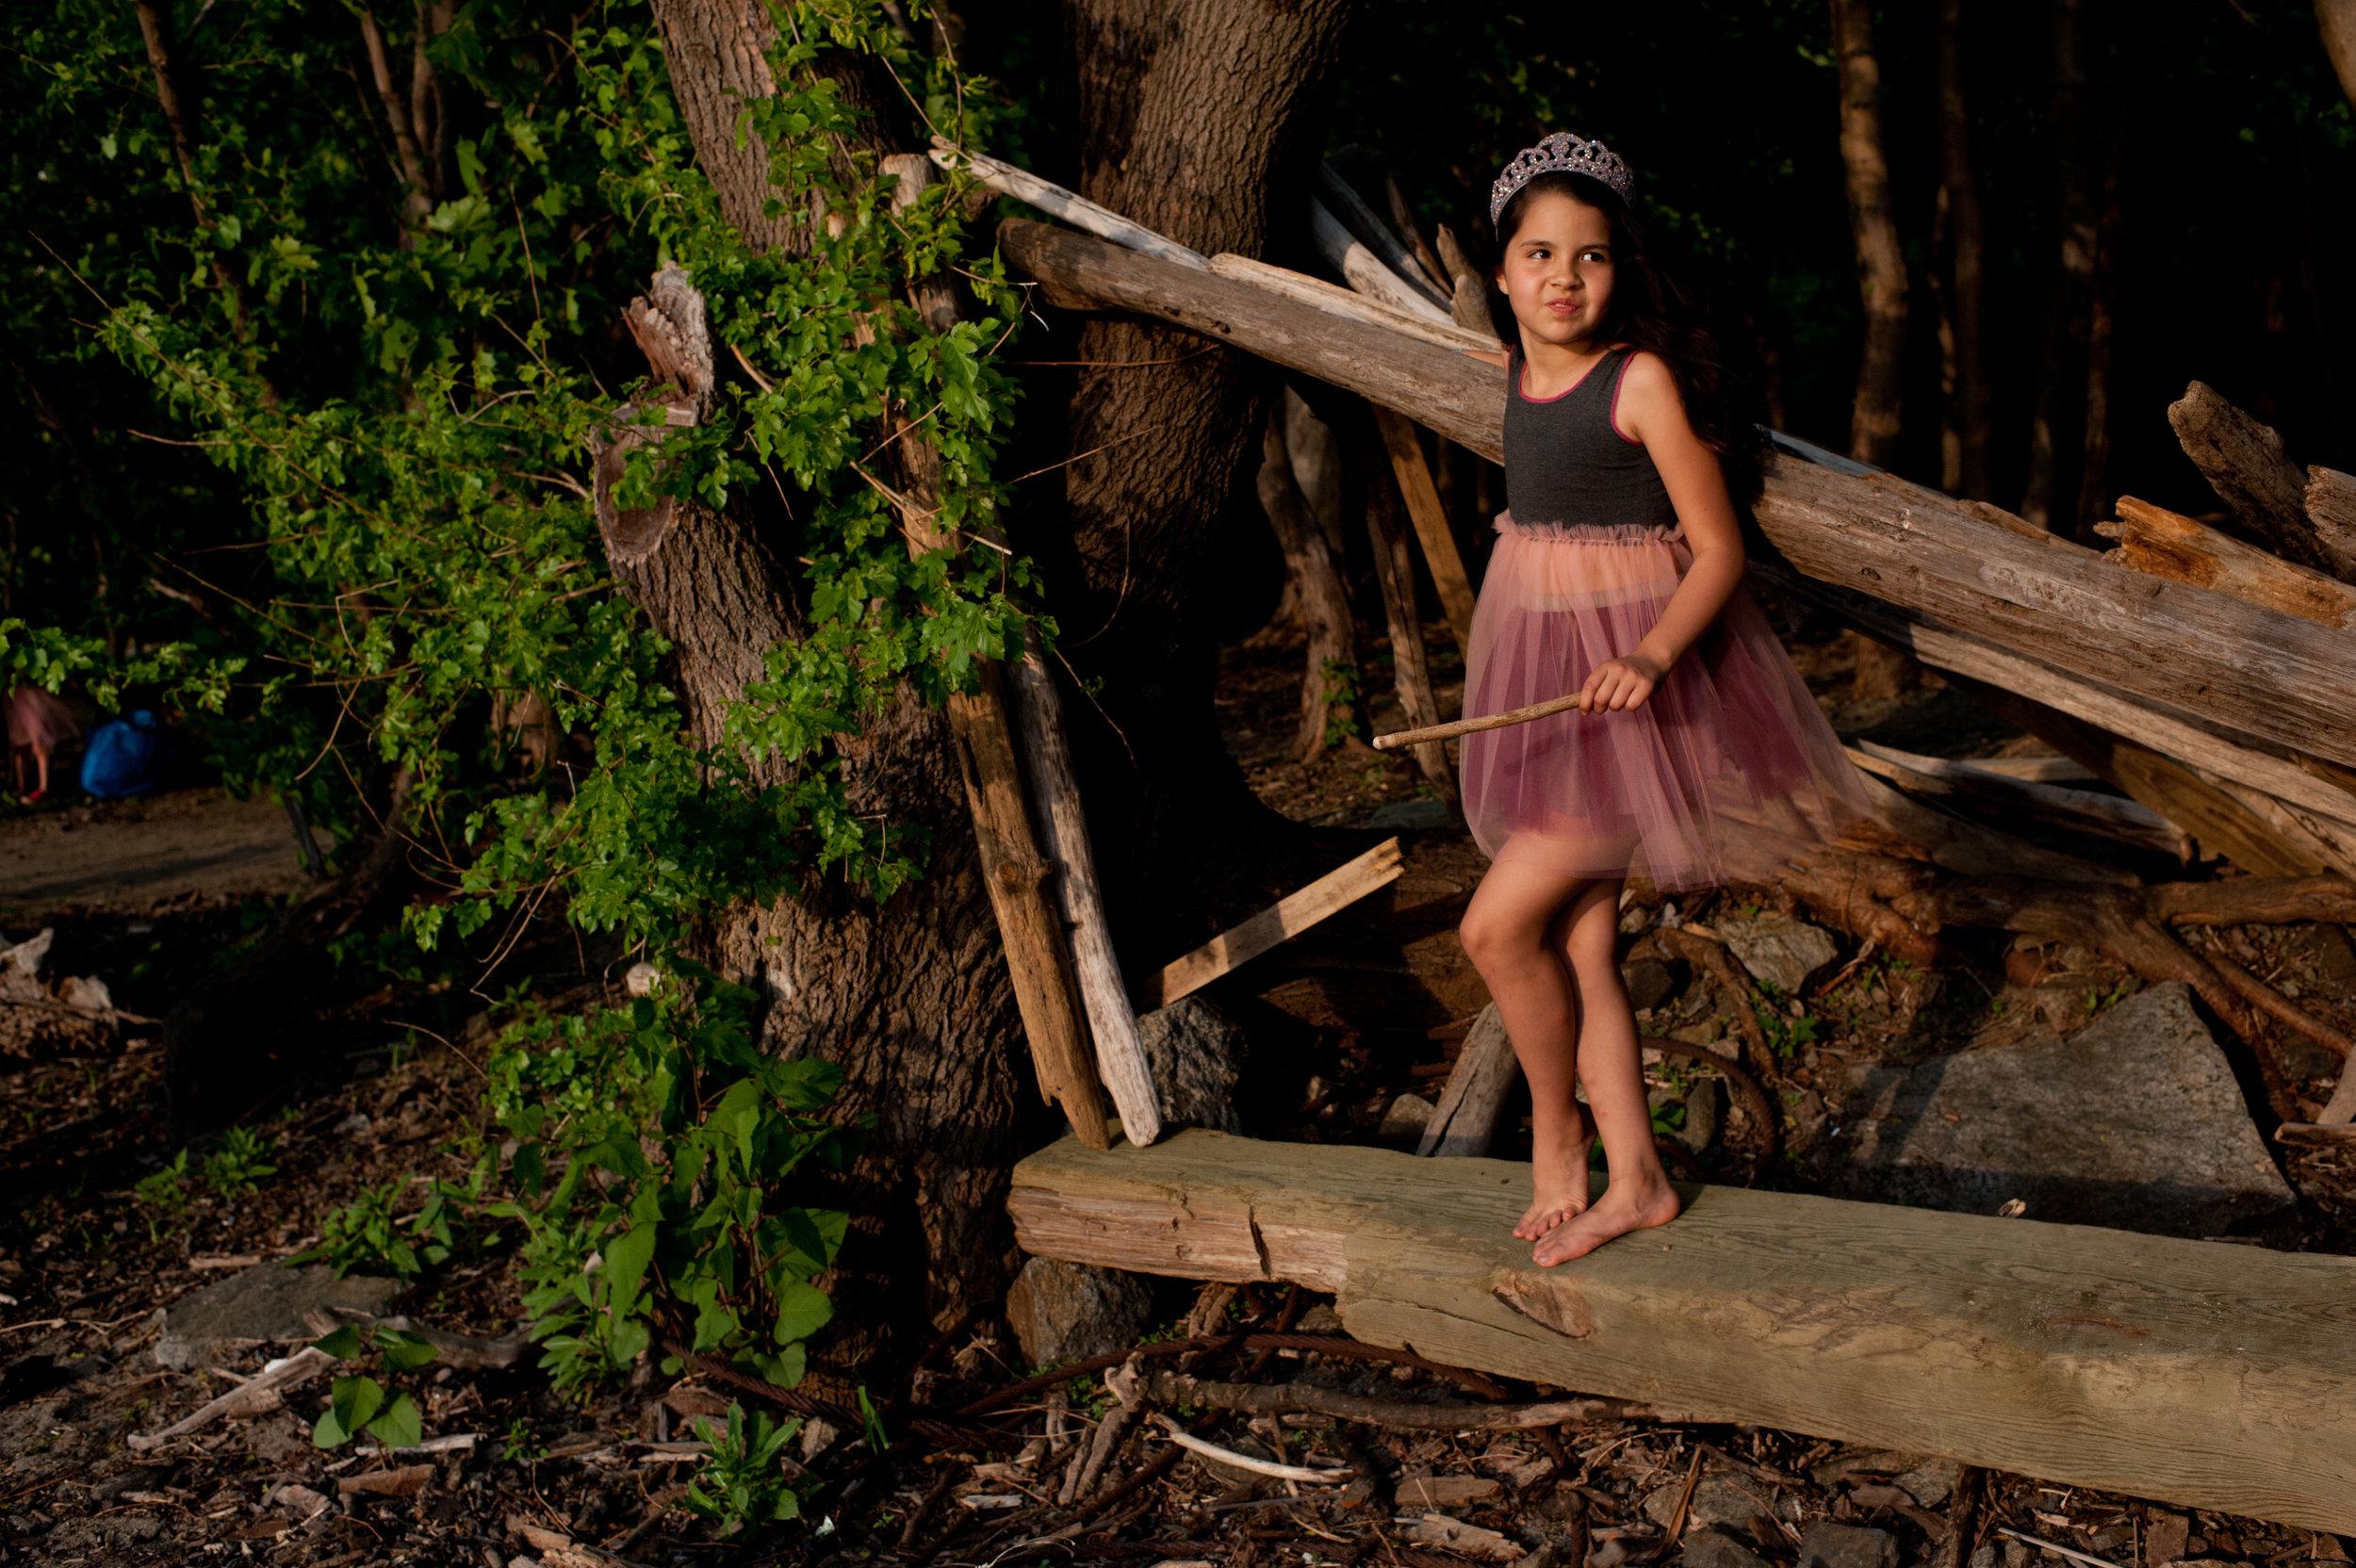 Caroline-Kaye-Photography-Swing-Cold-Spring-1